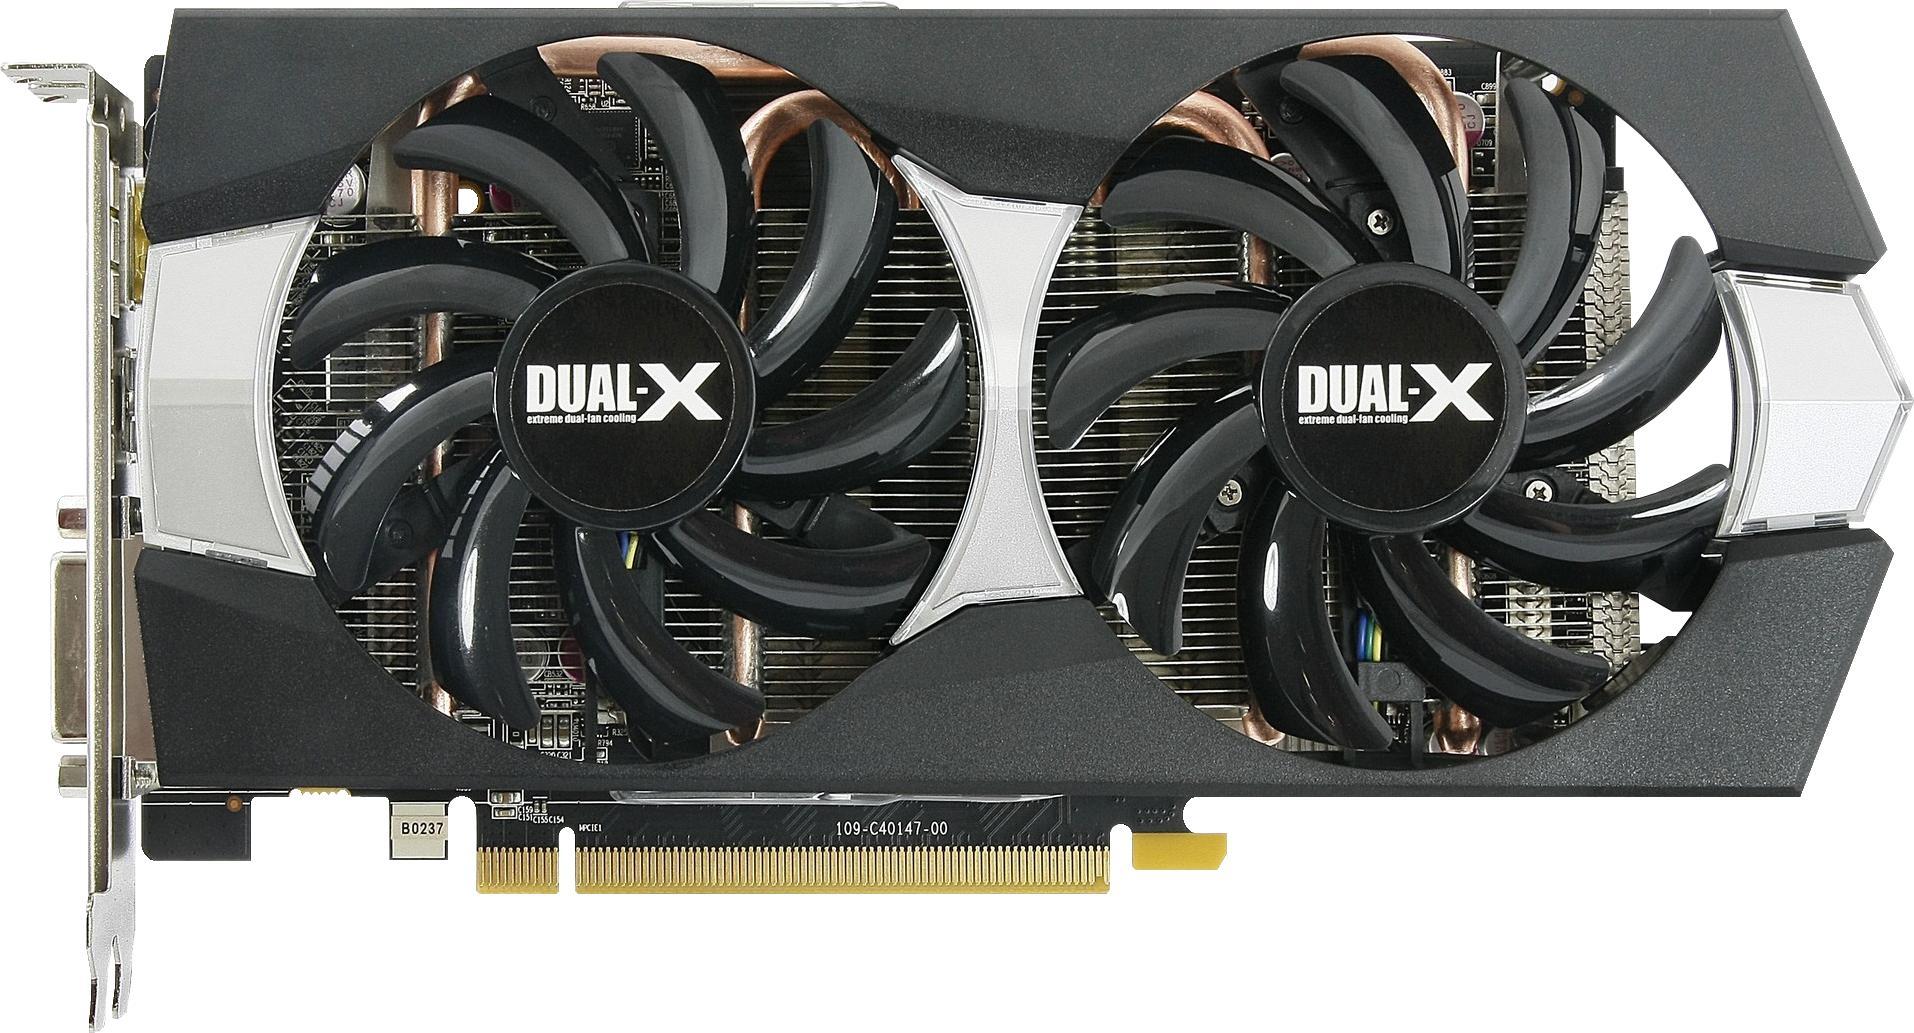 Sapphire R9 270X Dual-X 2 GB